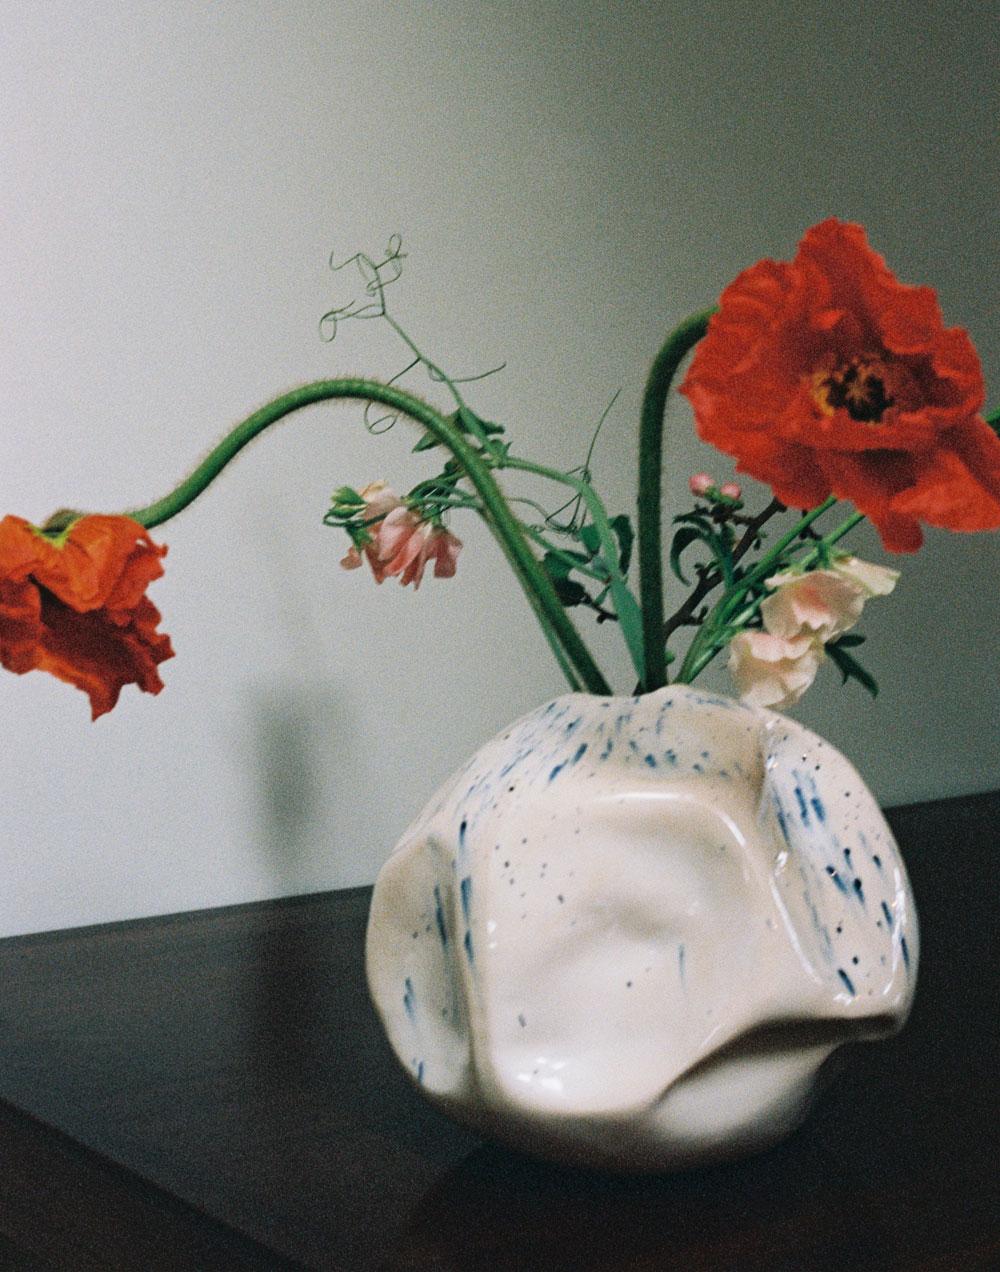 Completedworks-fold-ceramic-vase-silence-of-the-sea.jpg